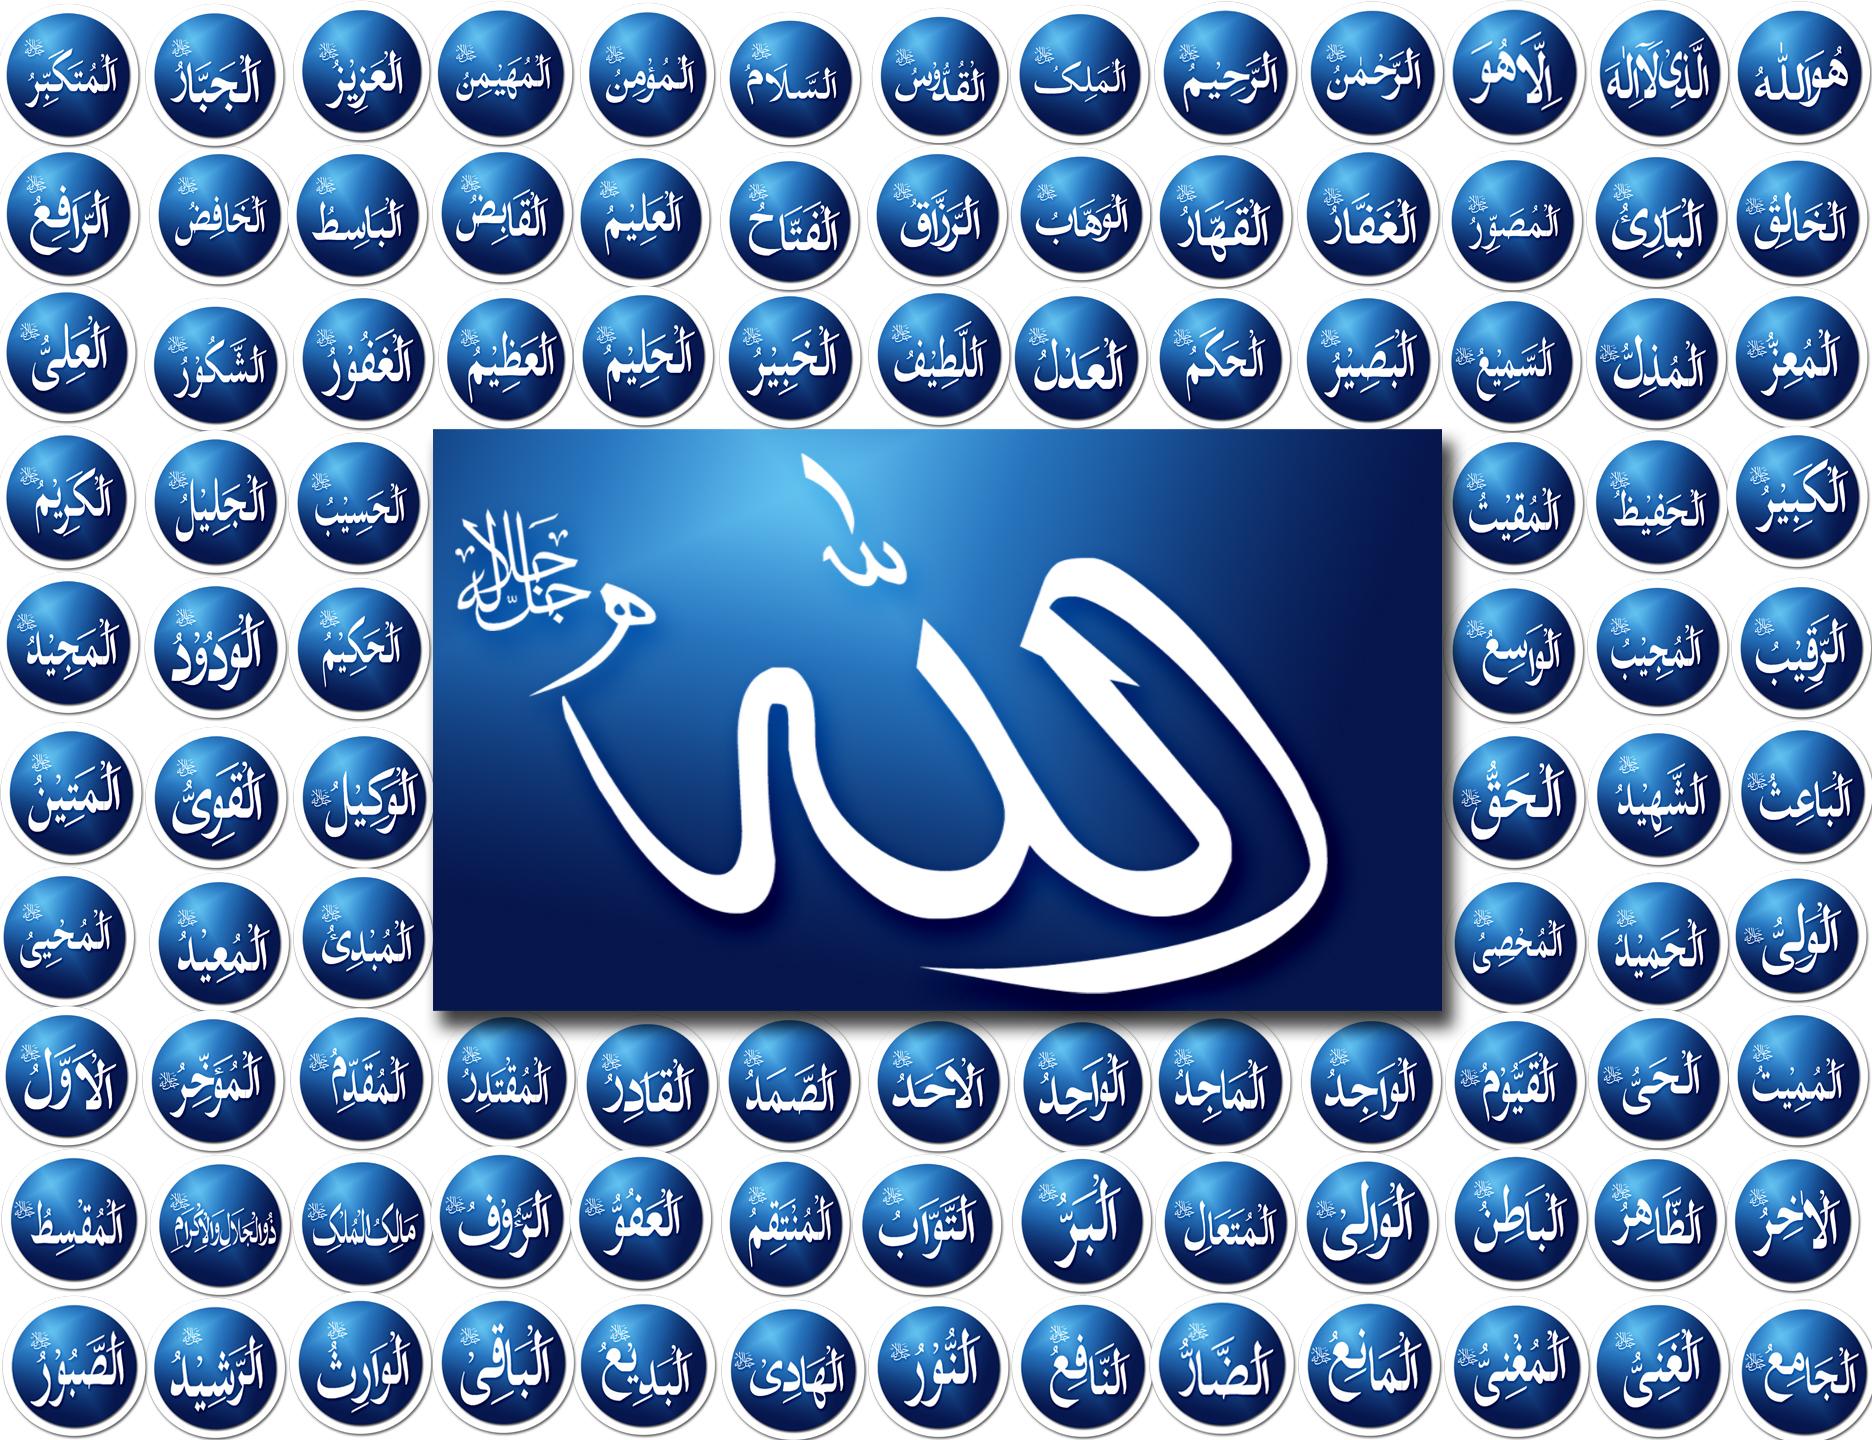 50+] 99 Names of Allah Wallpaper on ...